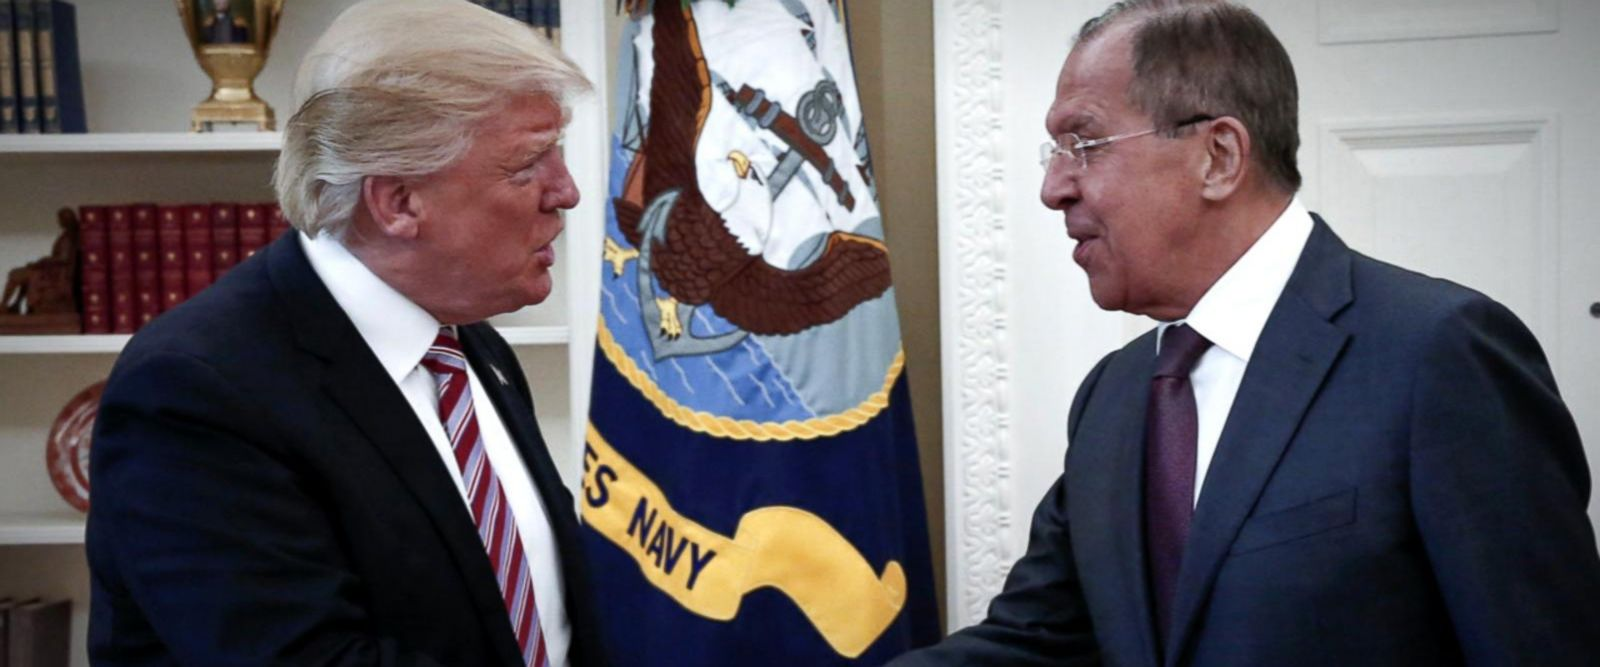 VIDEO: Trump disclosed sensitive Israeli intelligence to Russians, officials say